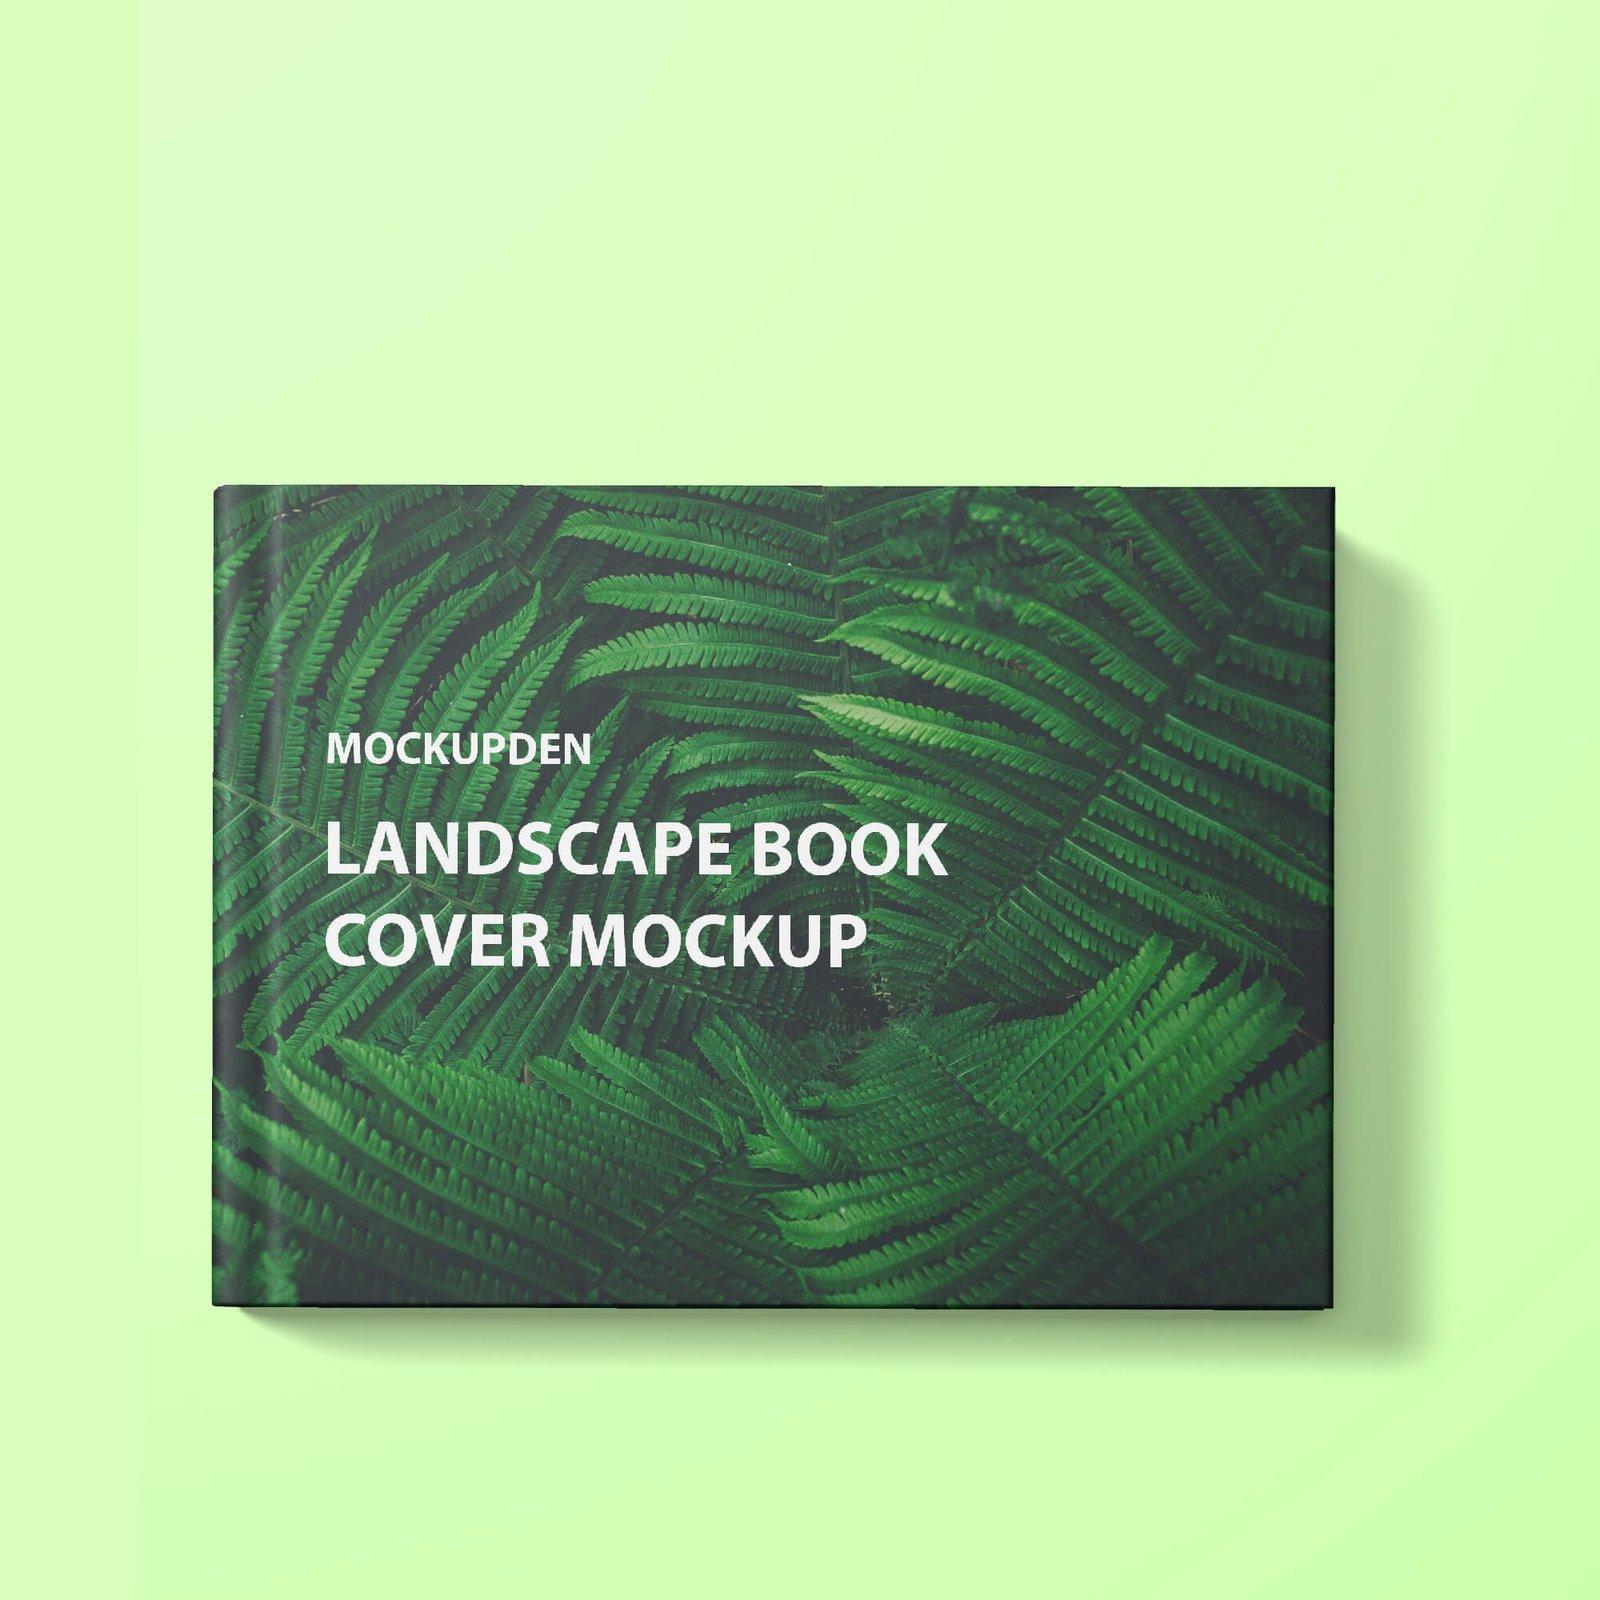 Design Free Landscape Book Cover Mockup PSD Template